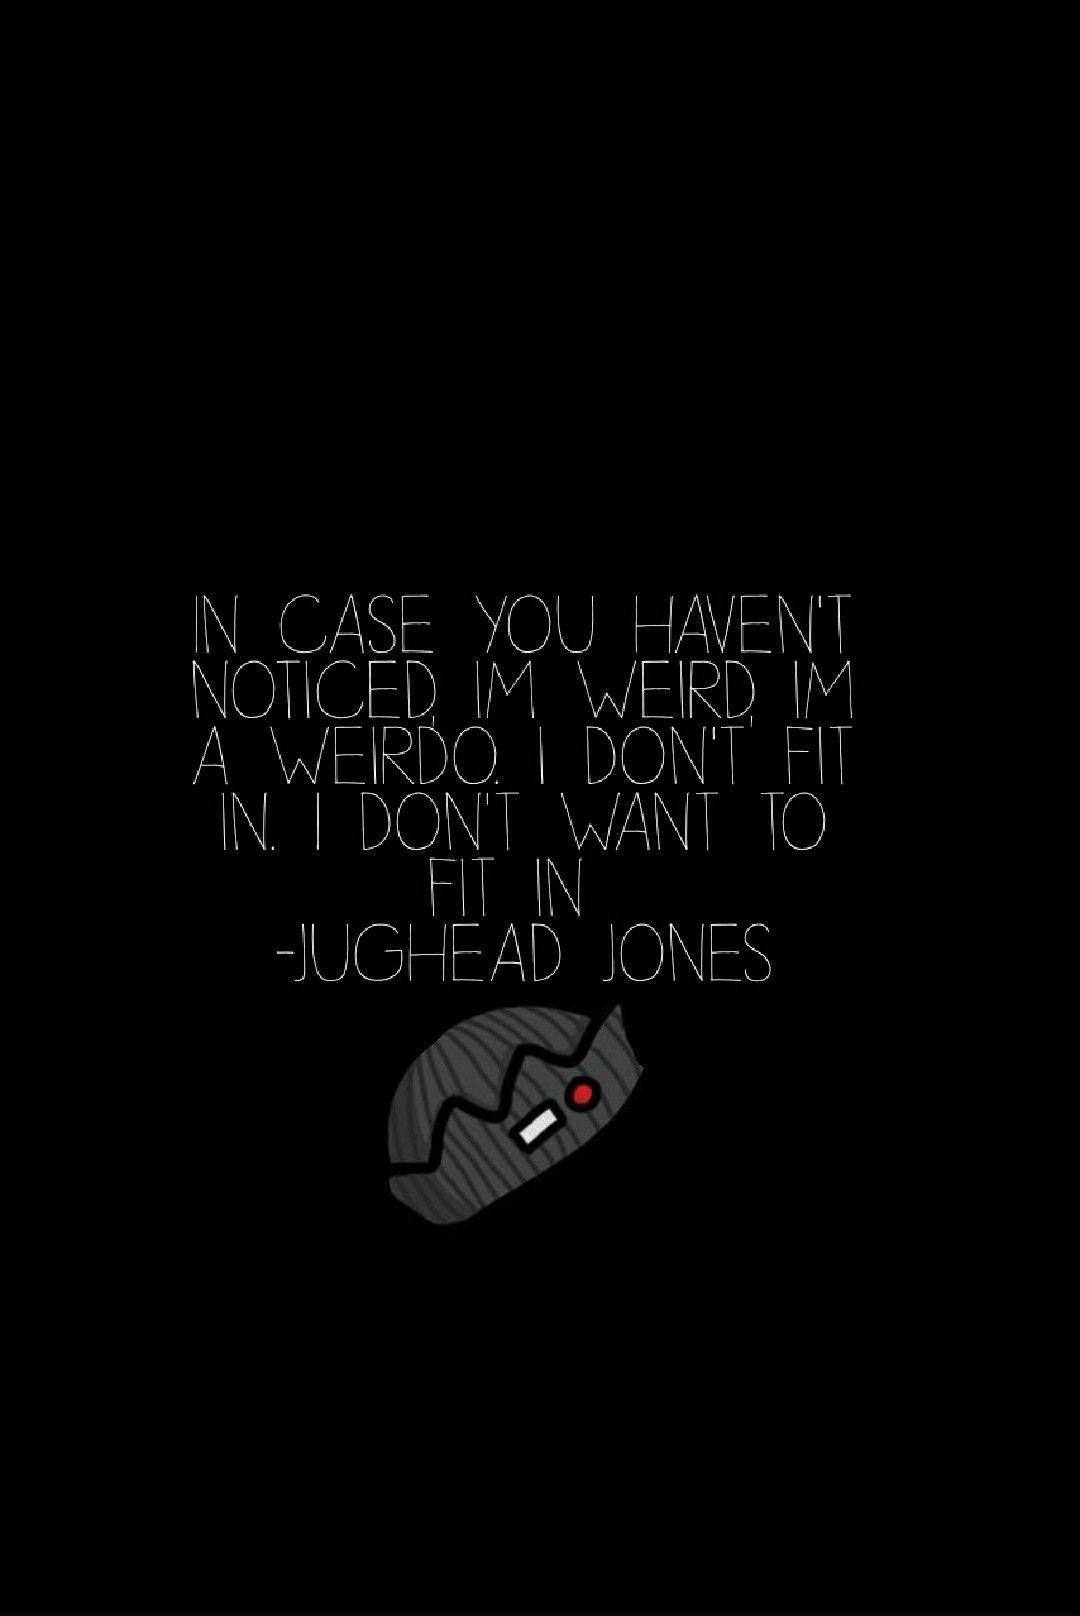 Jughead Jones Bughead riverdale, Riverdale funny, Riverdale